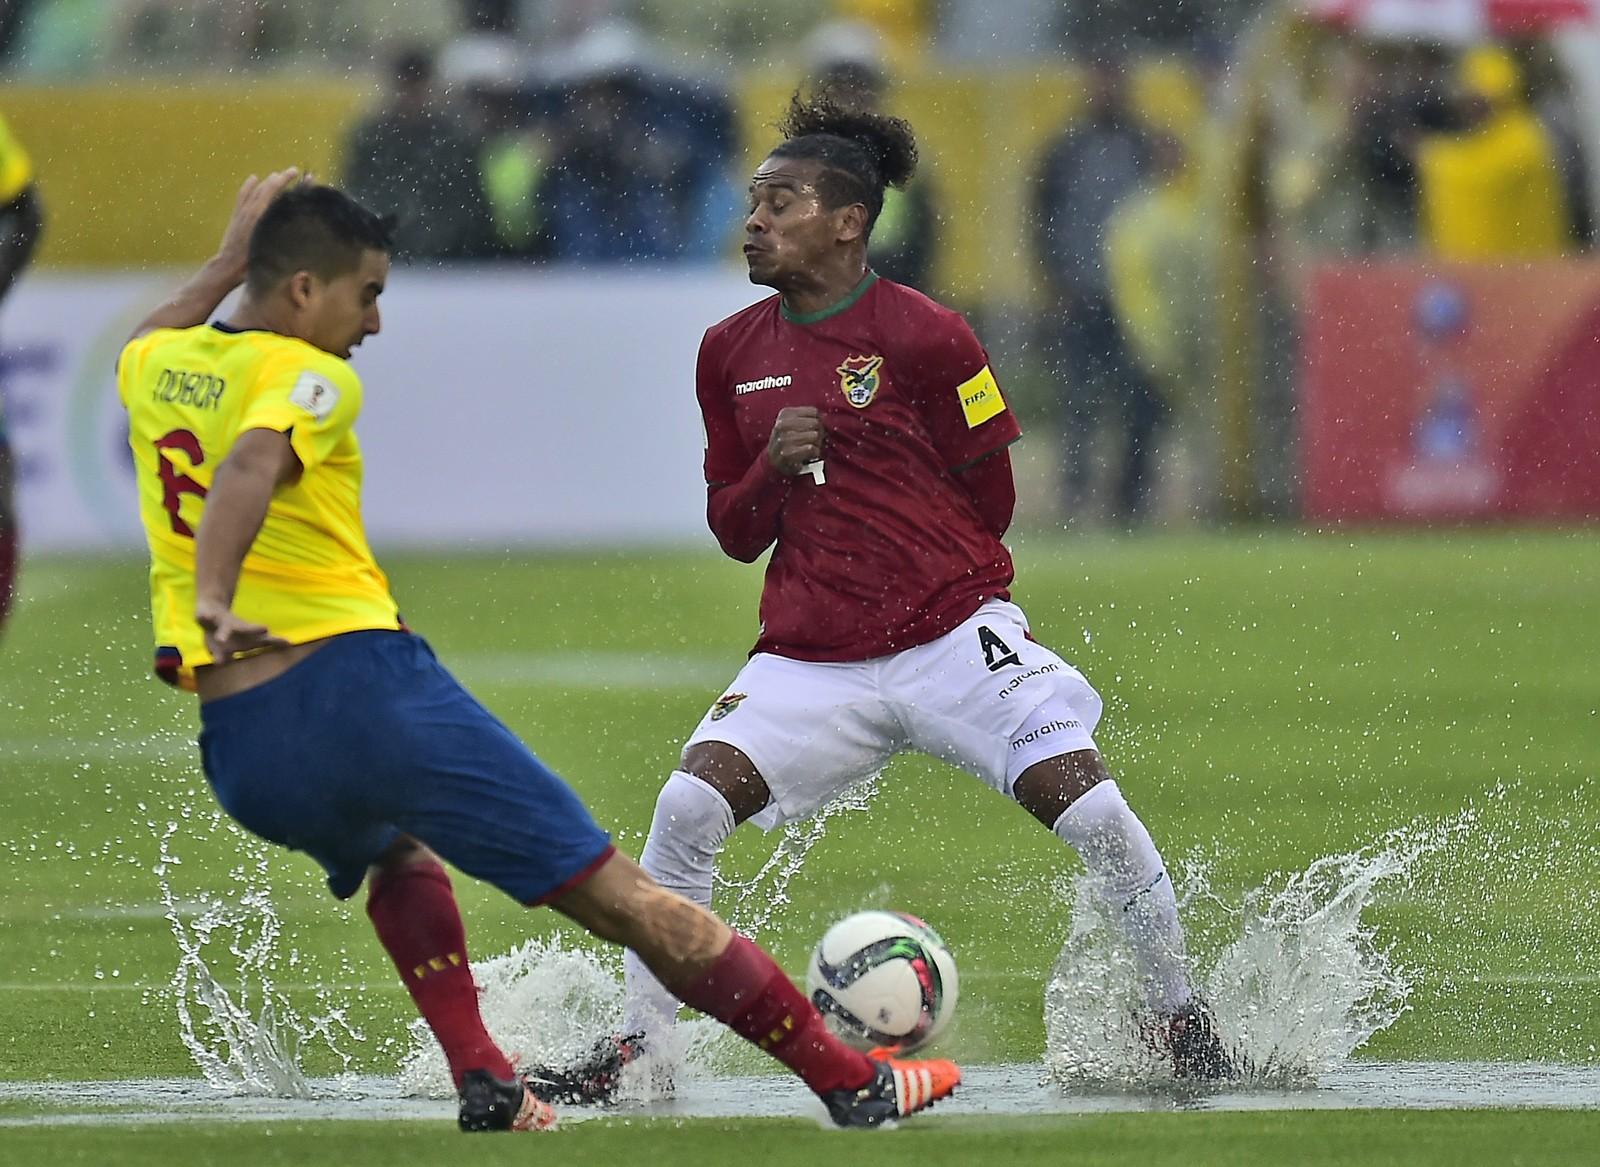 Ecuadors Christian Noboa sparker ballen mellom beina til Bolivias Alejandro Leonel Morales under en over snittet våt fotballkamp på Estadio Olimpico Atahualpa i Quito. Kampen var en del av Sør-Amerikas kvalifiseringsspill til VM i Russland 2018. Ecuador vant 2-0.